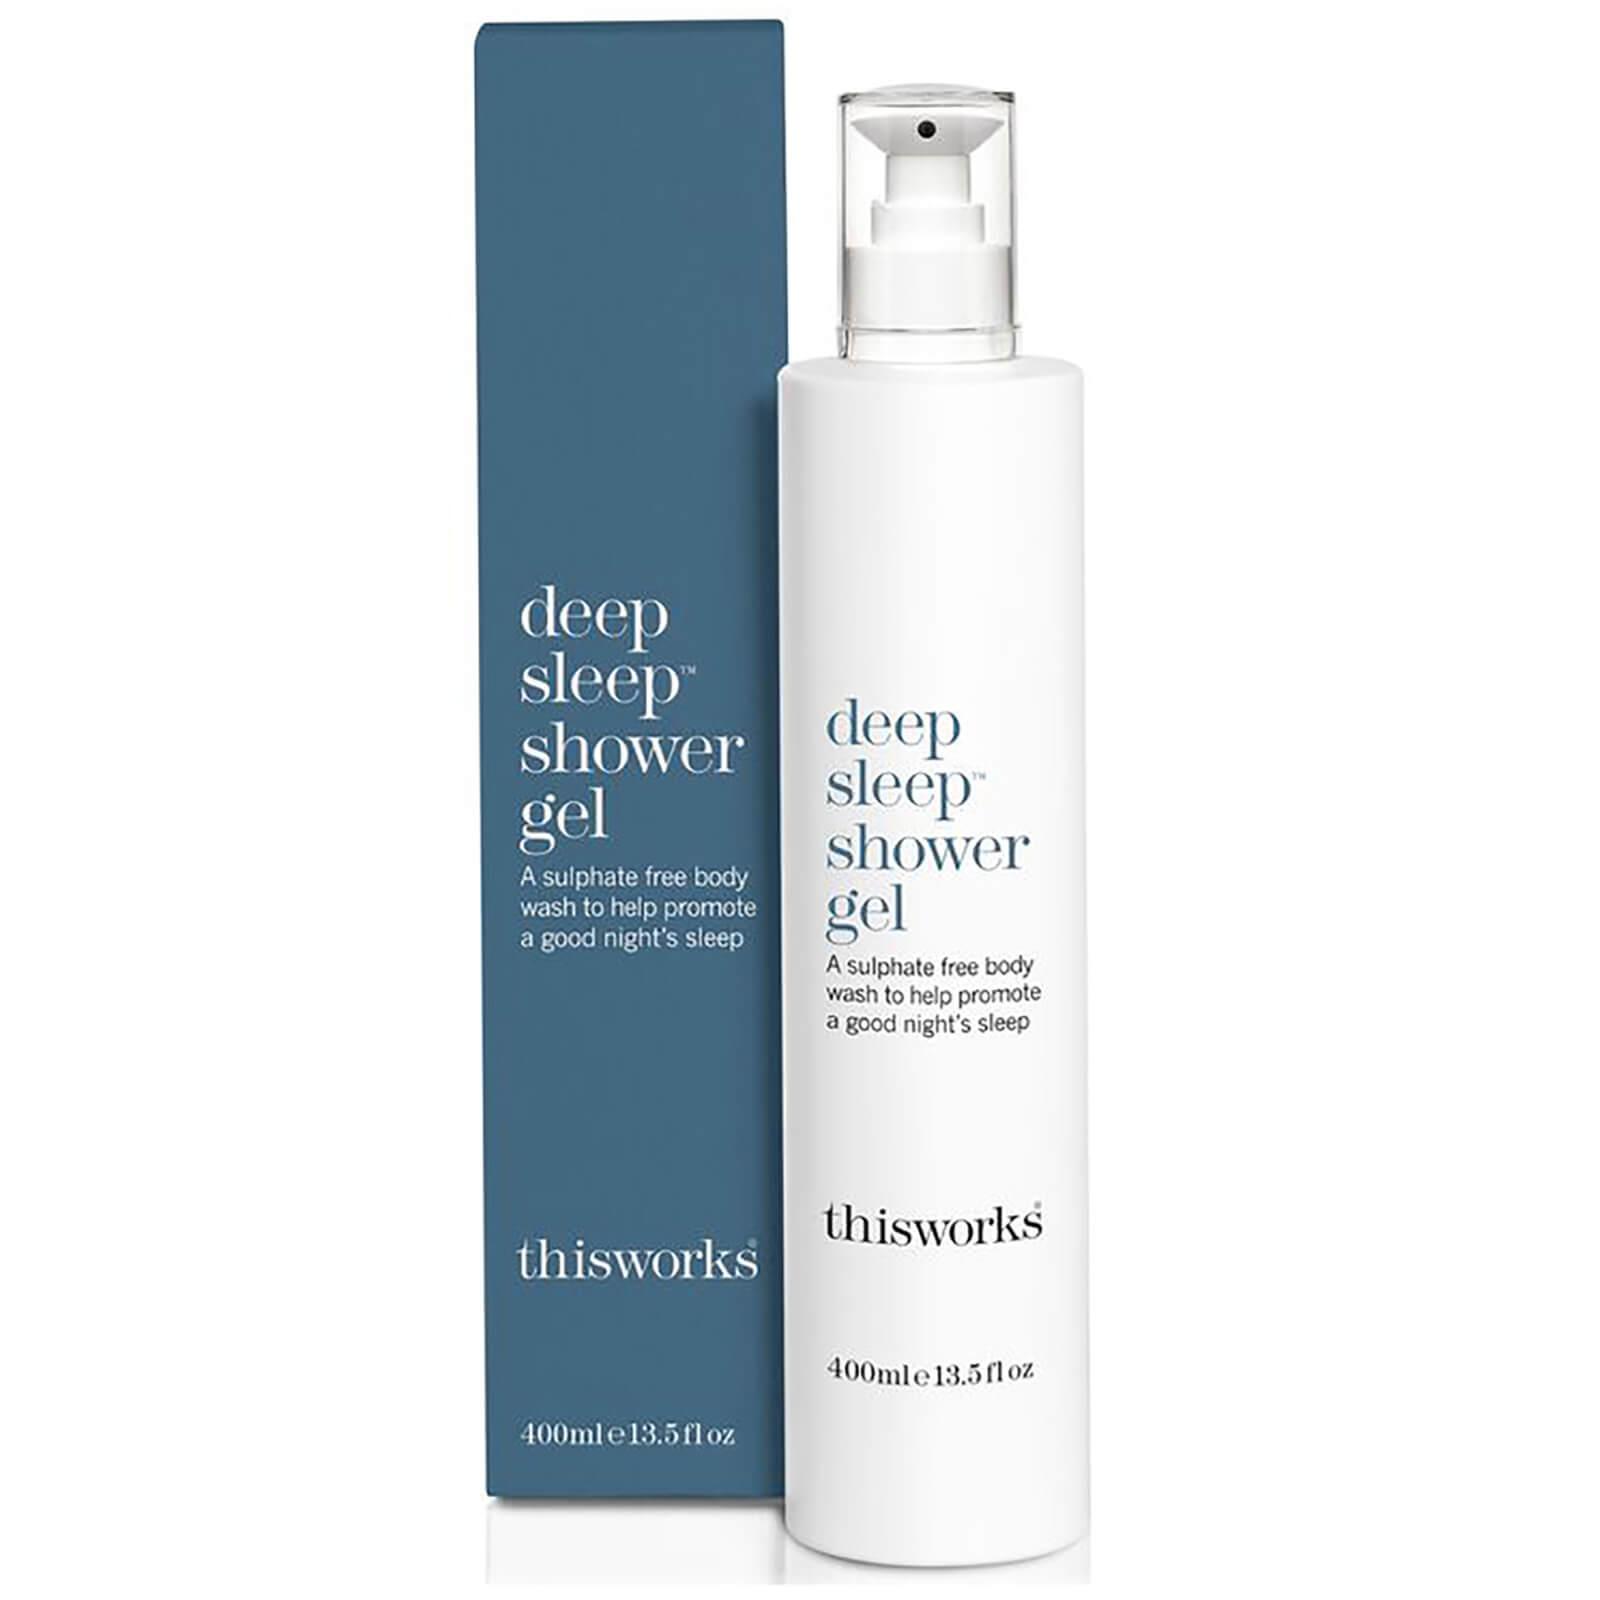 This Works Deep Sleep Shower Gel 400ml Beautyexpert Deryan Toddler Luxe Cream Pueter Travel Sleeping Cot Bed Product Description